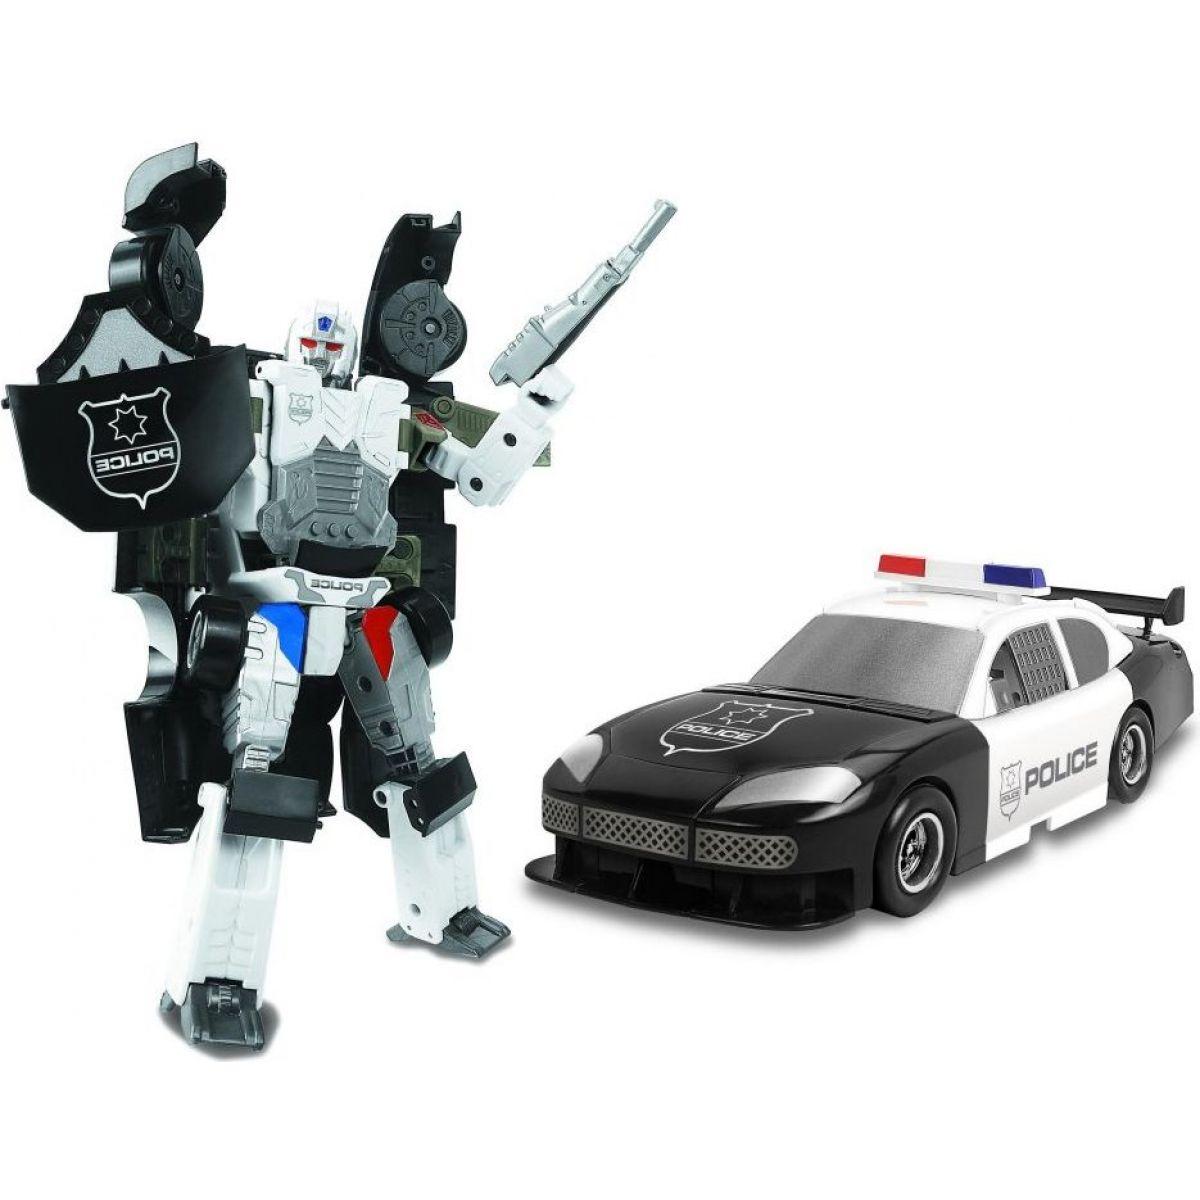 HM STUDIO X Bot policie